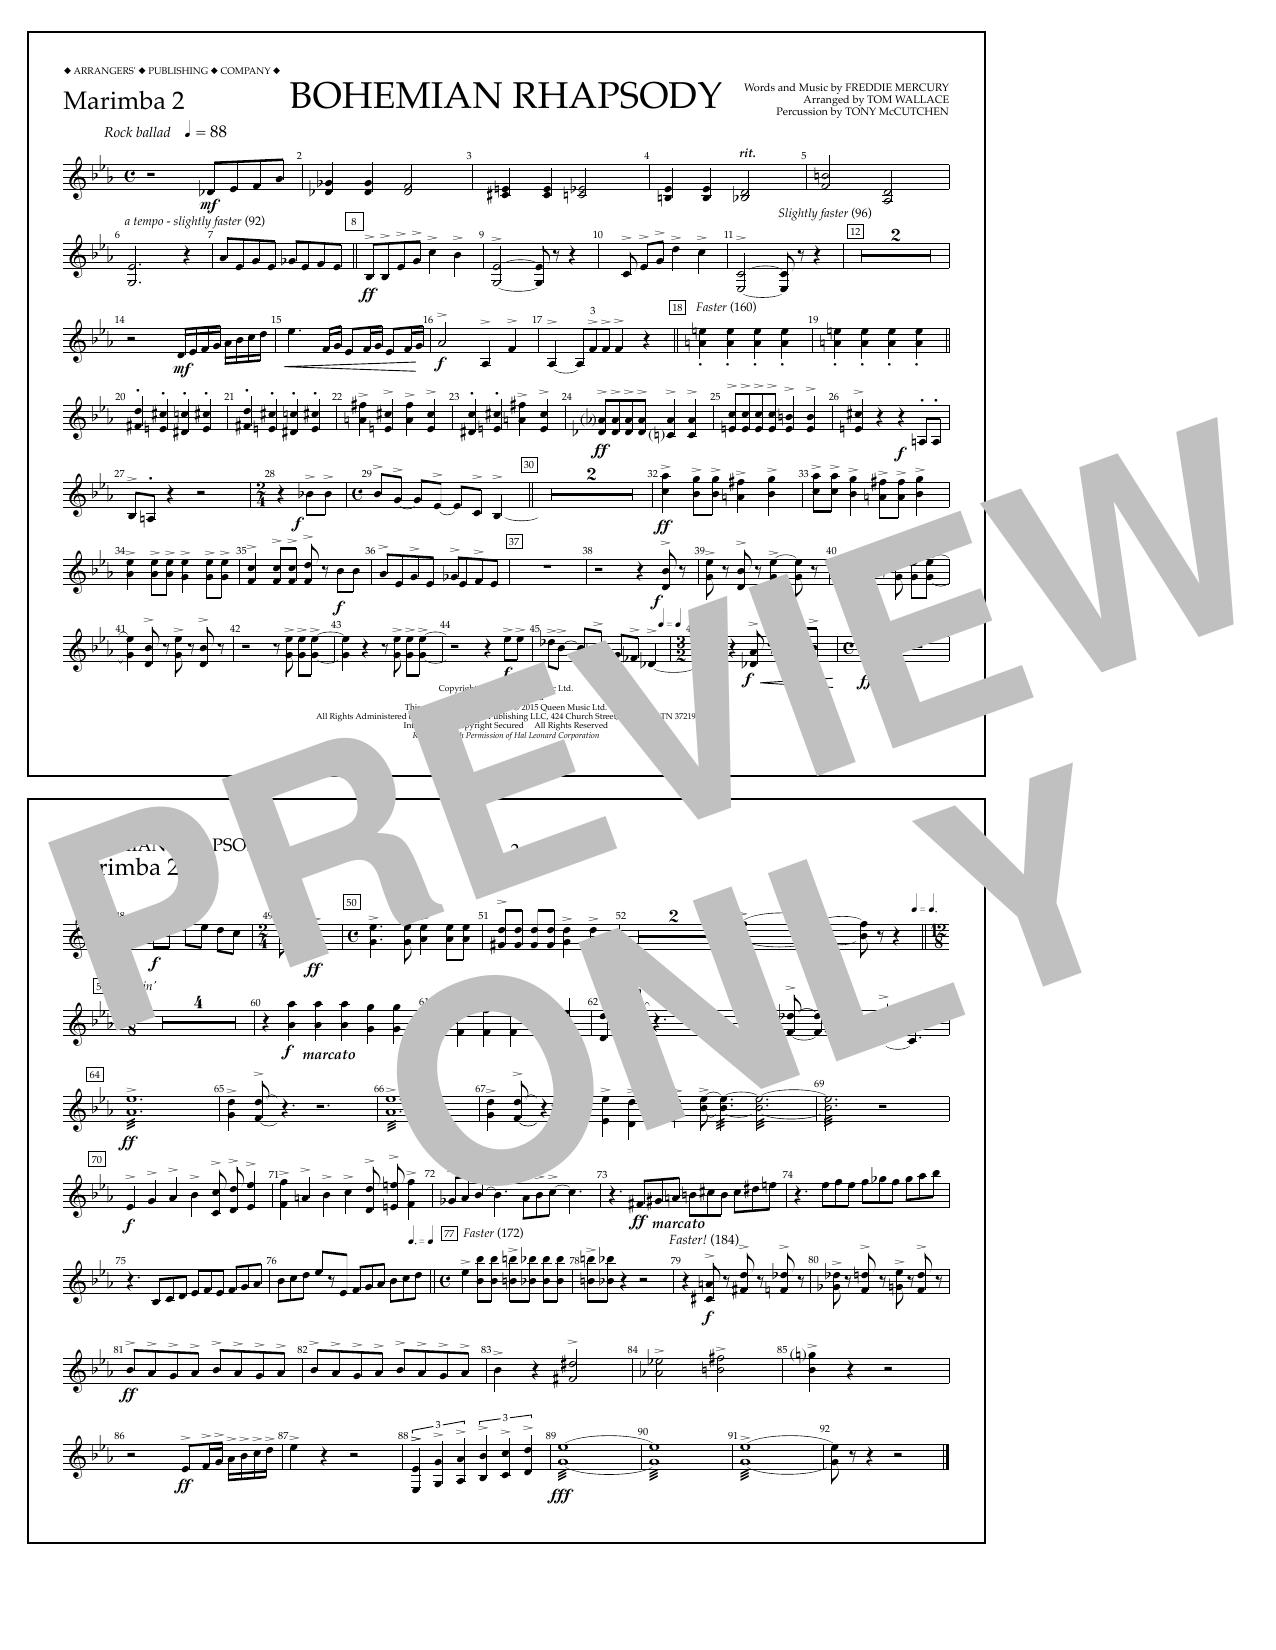 Bohemian Rhapsody - Marimba 2 Sheet Music